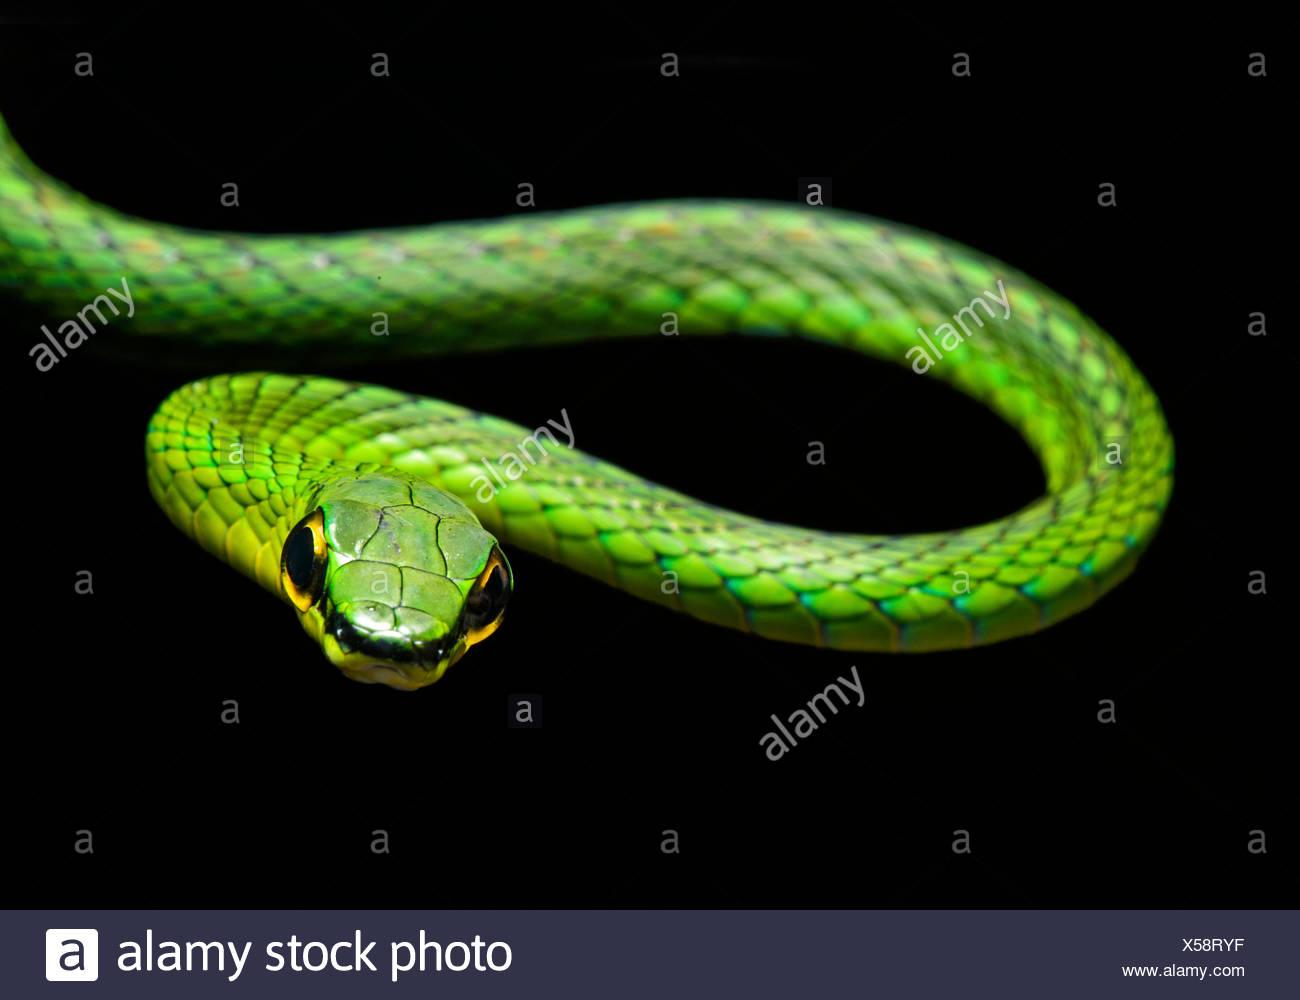 La viña de Cope snake (Oxybelis brevirostris), la serpiente (Colubridae), Chocó rainforest, Ecuador Imagen De Stock